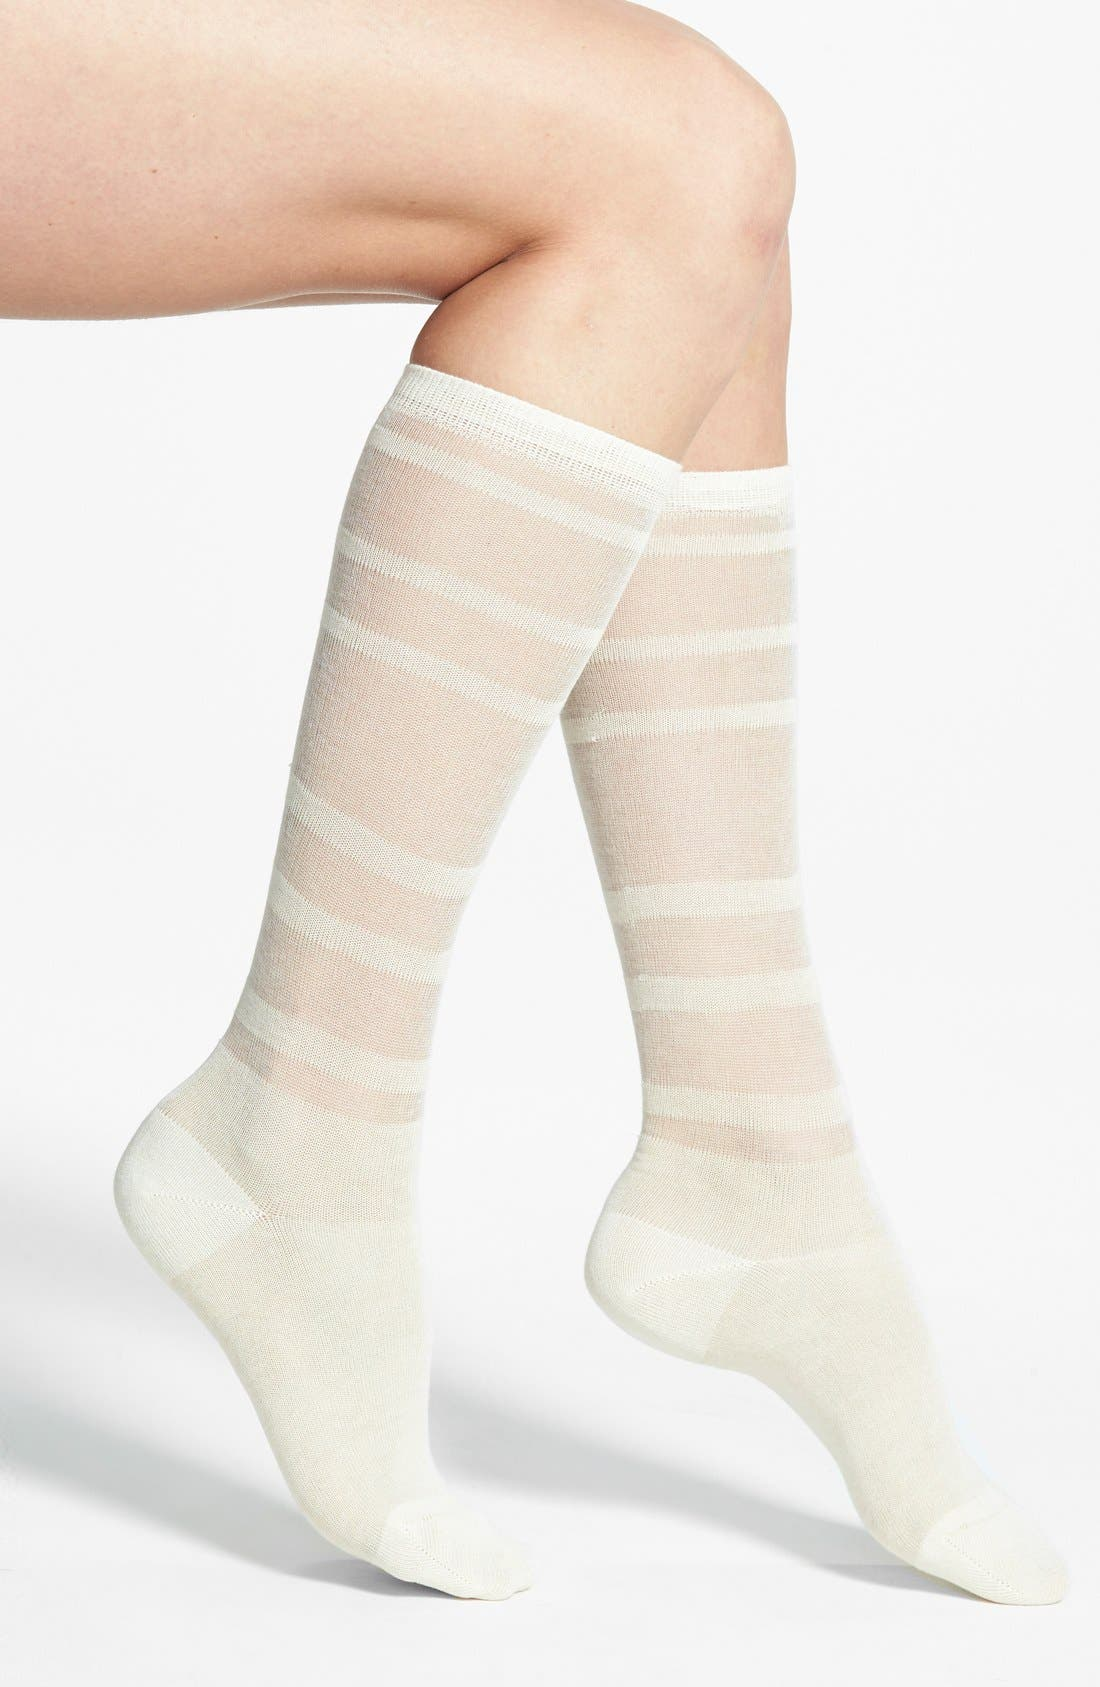 Alternate Image 1 Selected - Oroblu 'Calzino Nellie' Sheer Stripe Trouser Socks